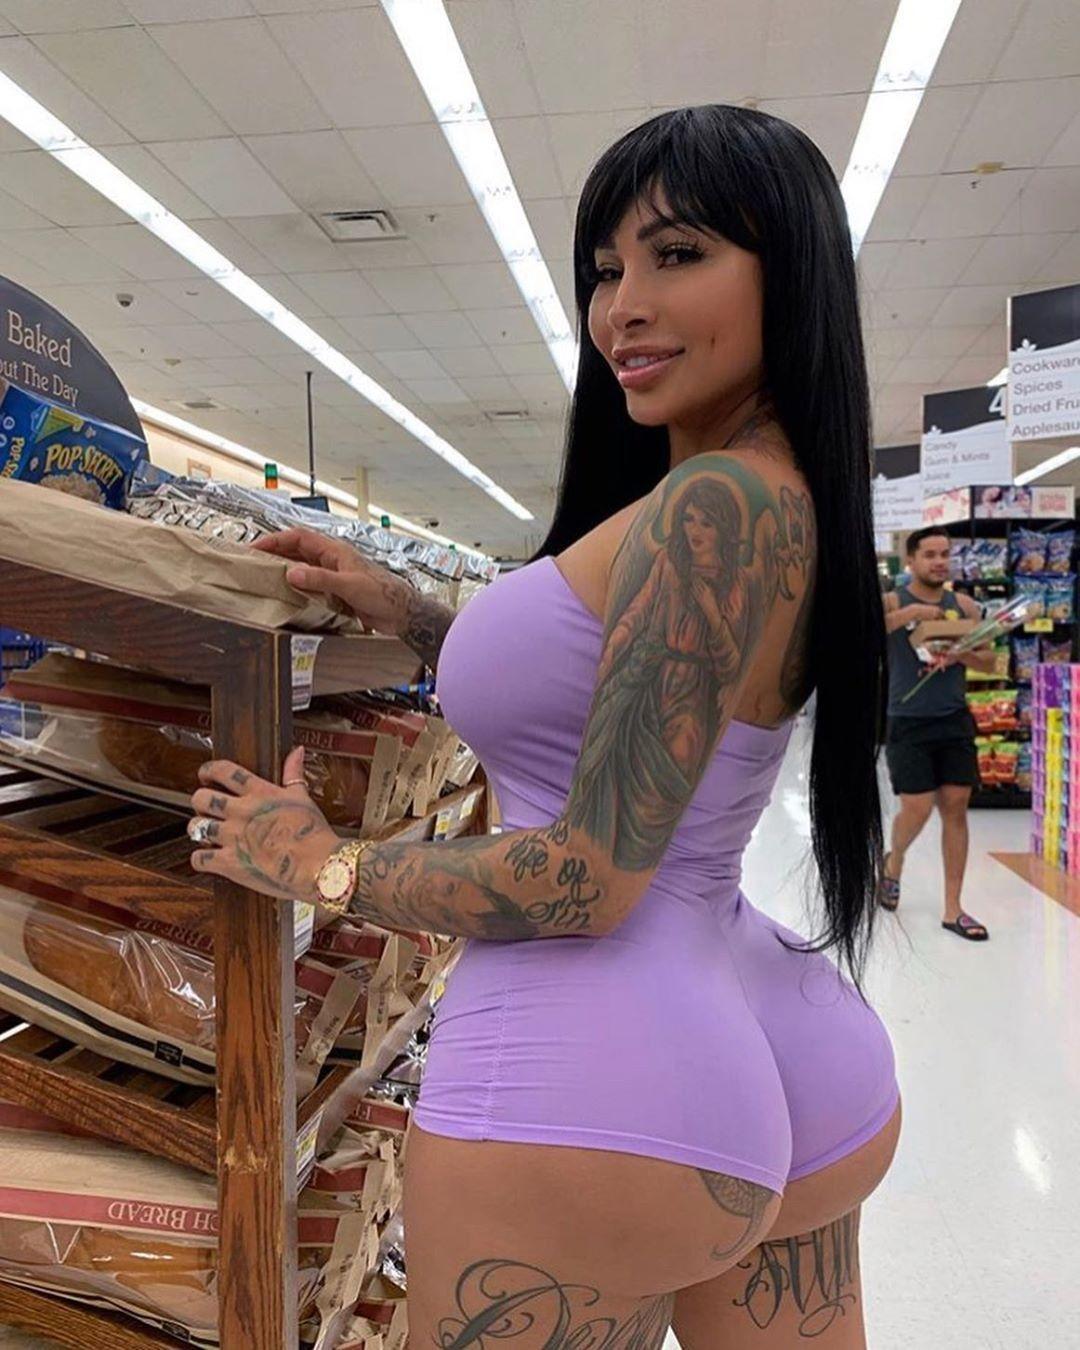 Actriz Porno Ebony Con Rastas thick hips,thighs & booty girls!!!!!❤